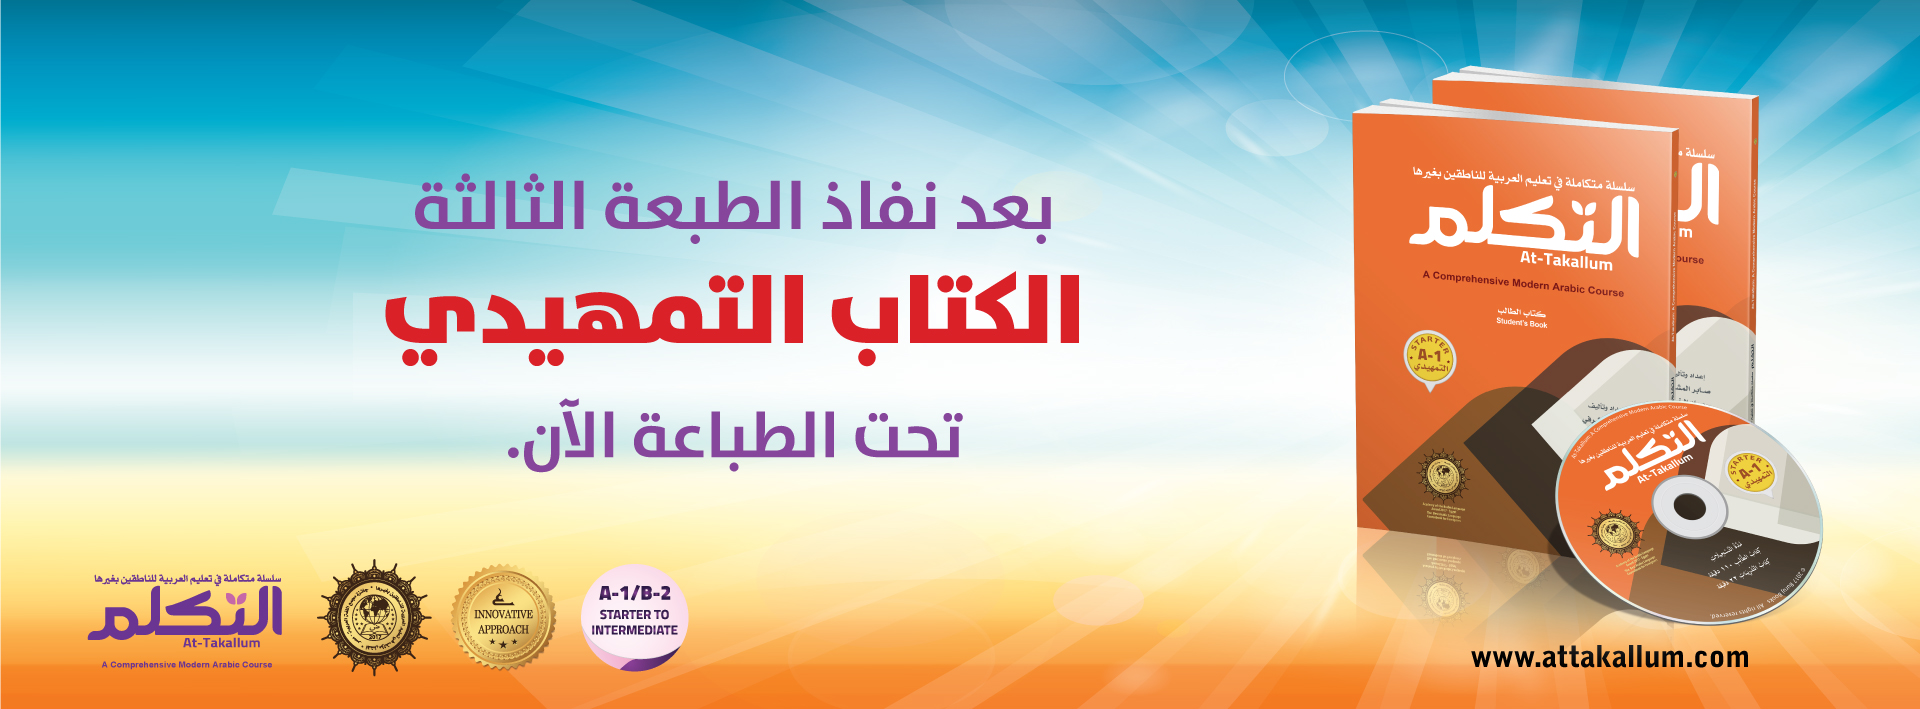 attakallum-Arabic-banner-2019-02